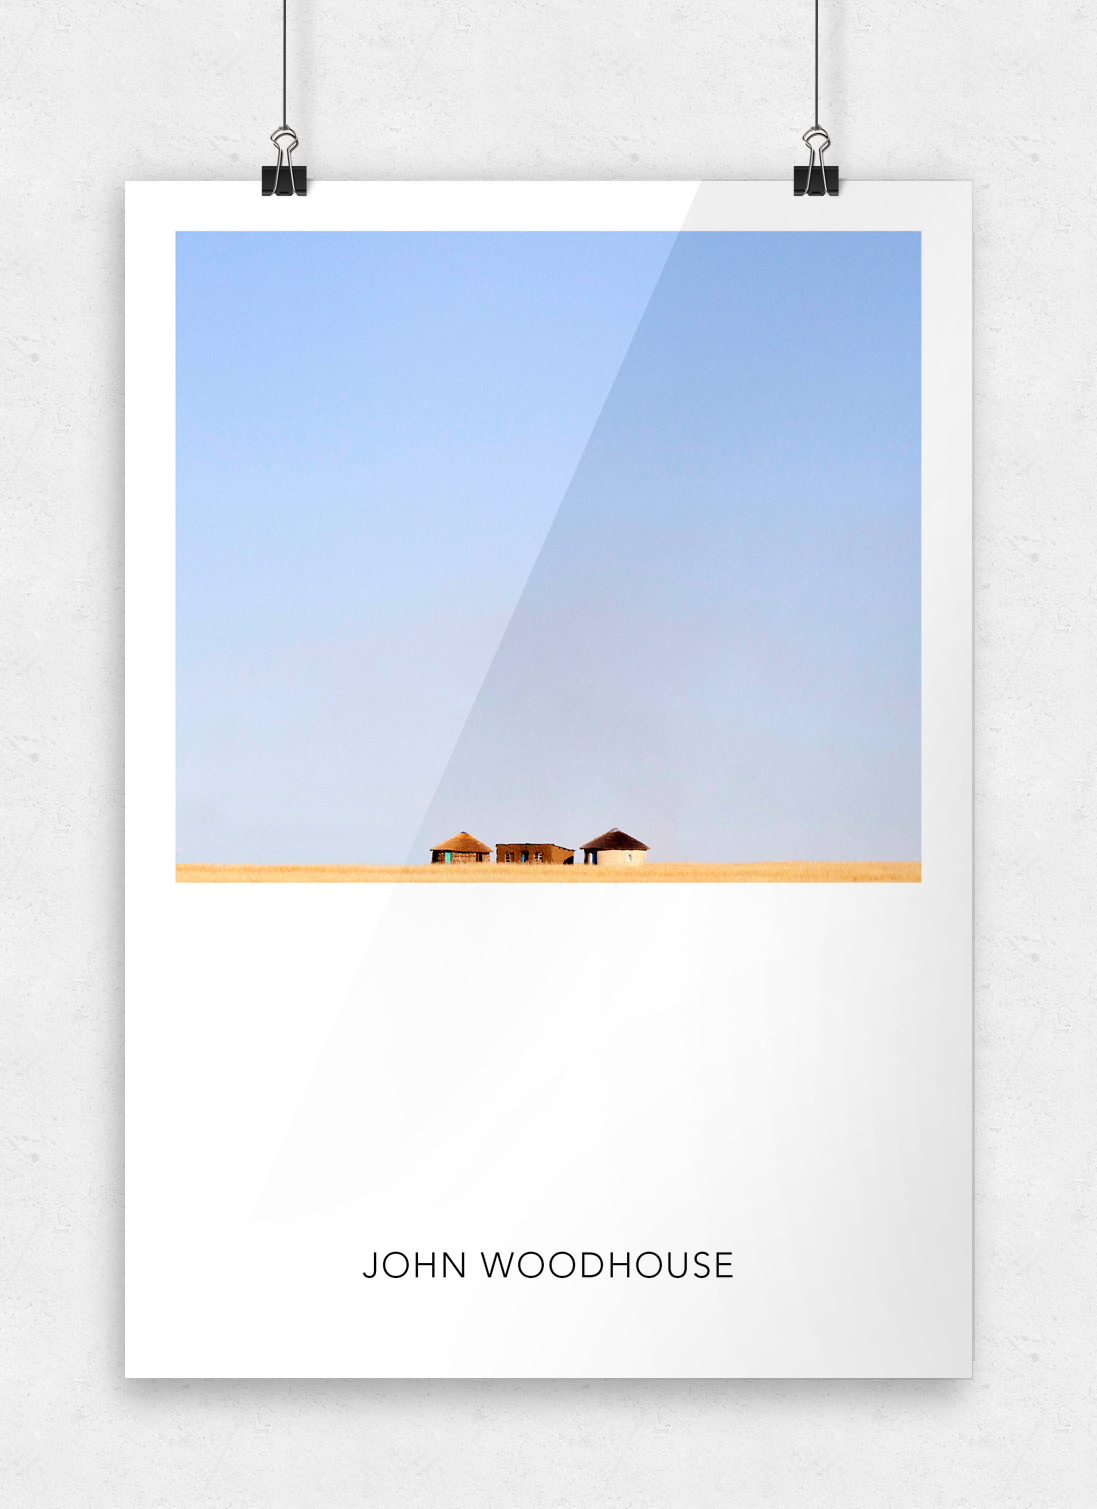 JW-Posters-Template_08.jpg